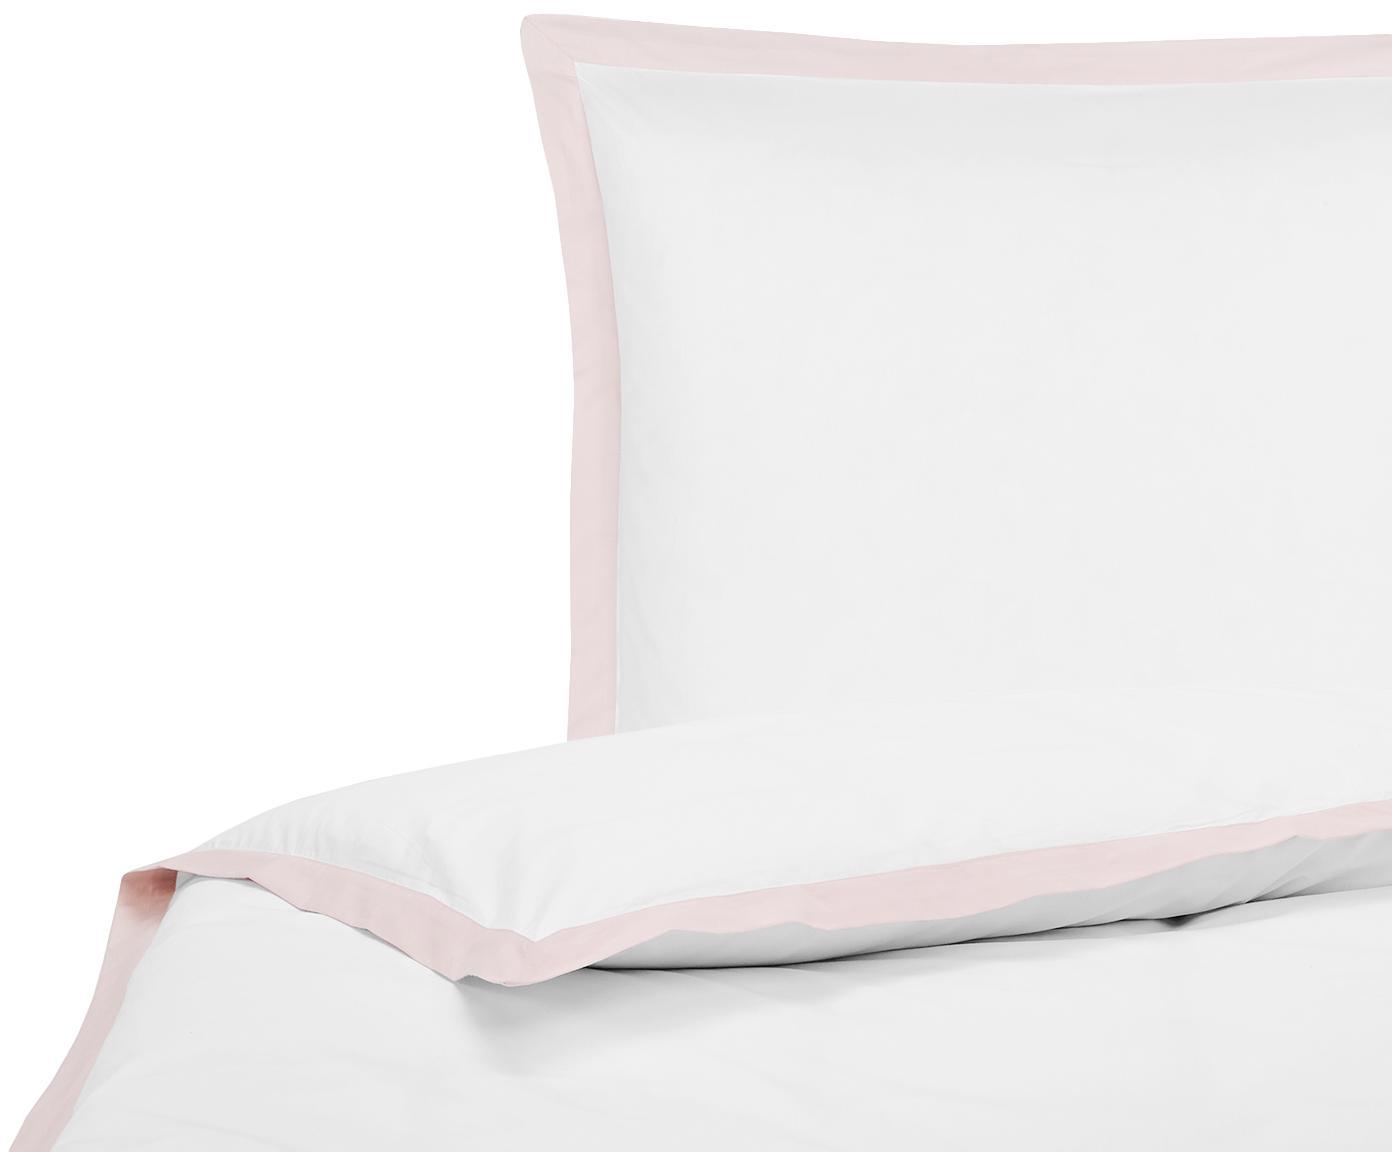 Perkal-Bettwäsche Joanna mit farblich abgesetztem Stehsaum, Webart: Perkal Fadendichte 200 TC, Weiß, Rosa, 135 x 200 cm